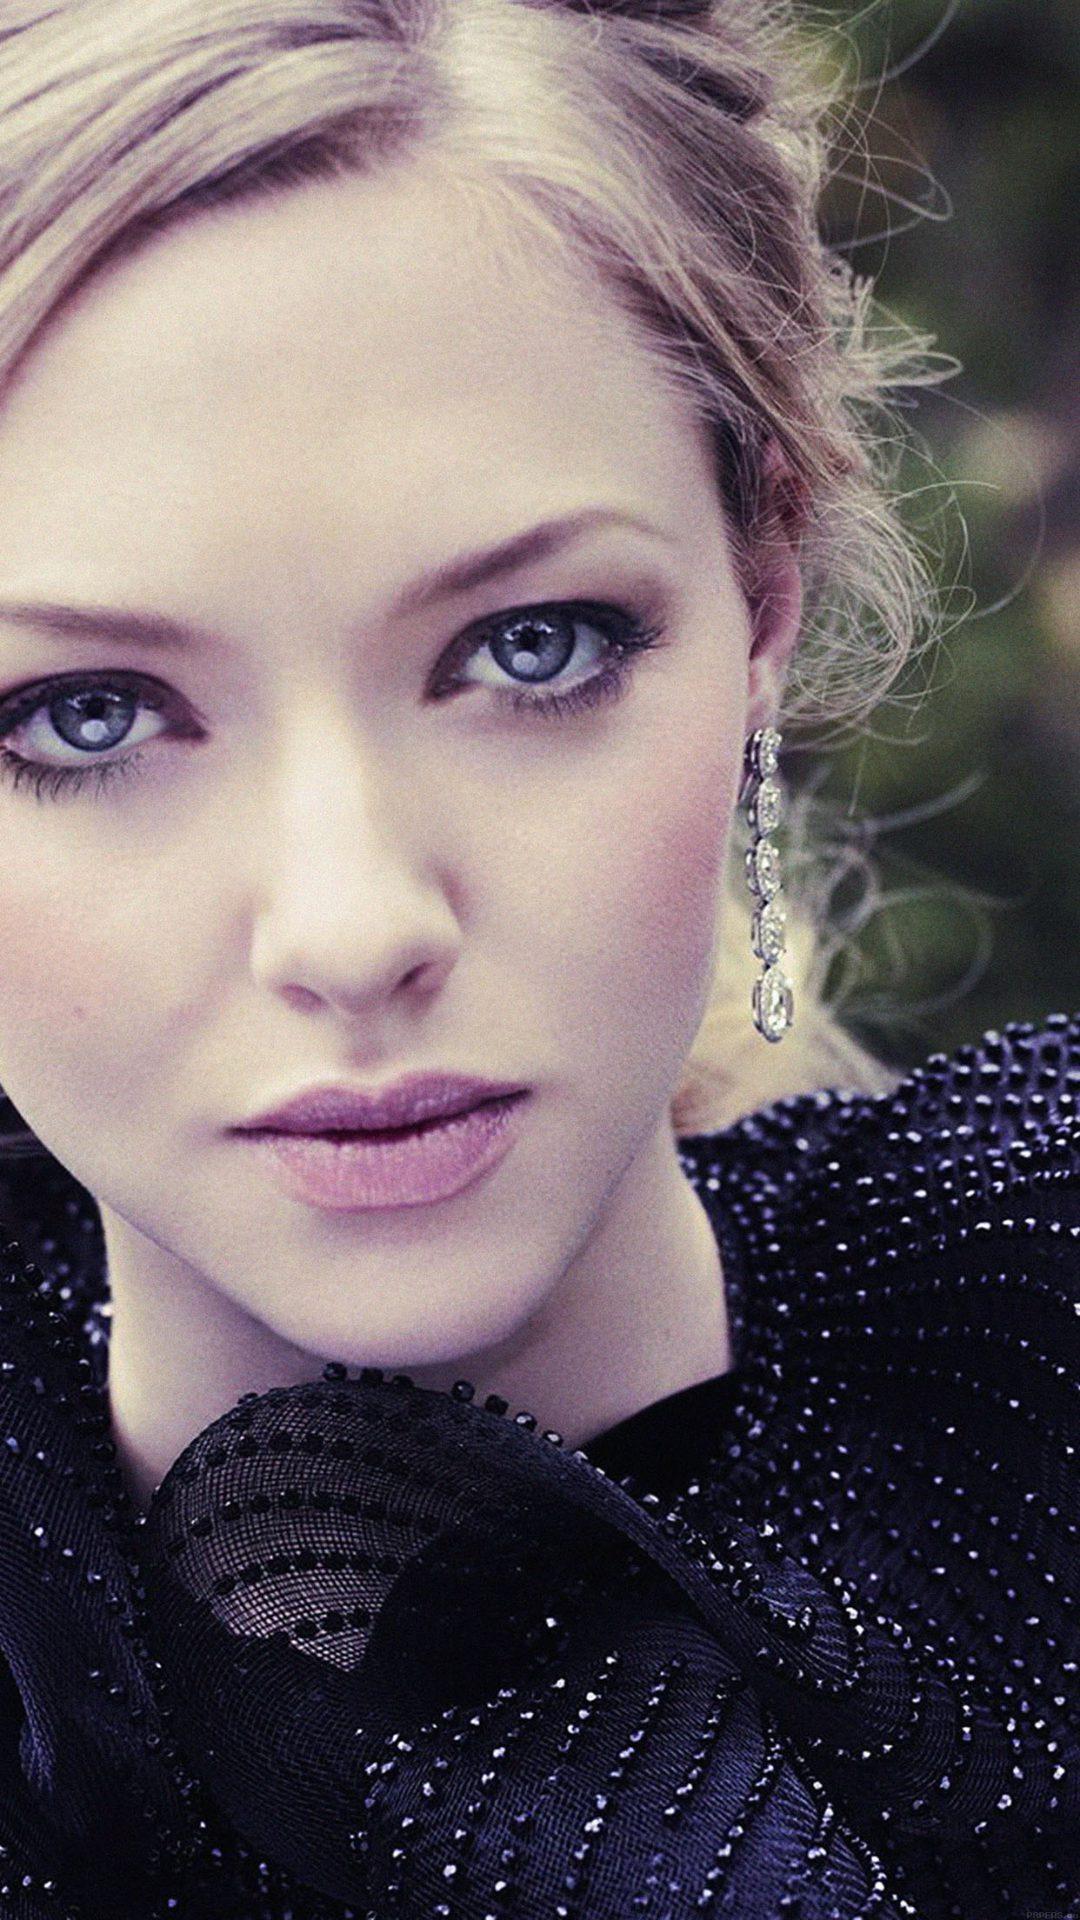 Wallpaper Amanda Seyfried Film Actress Girl